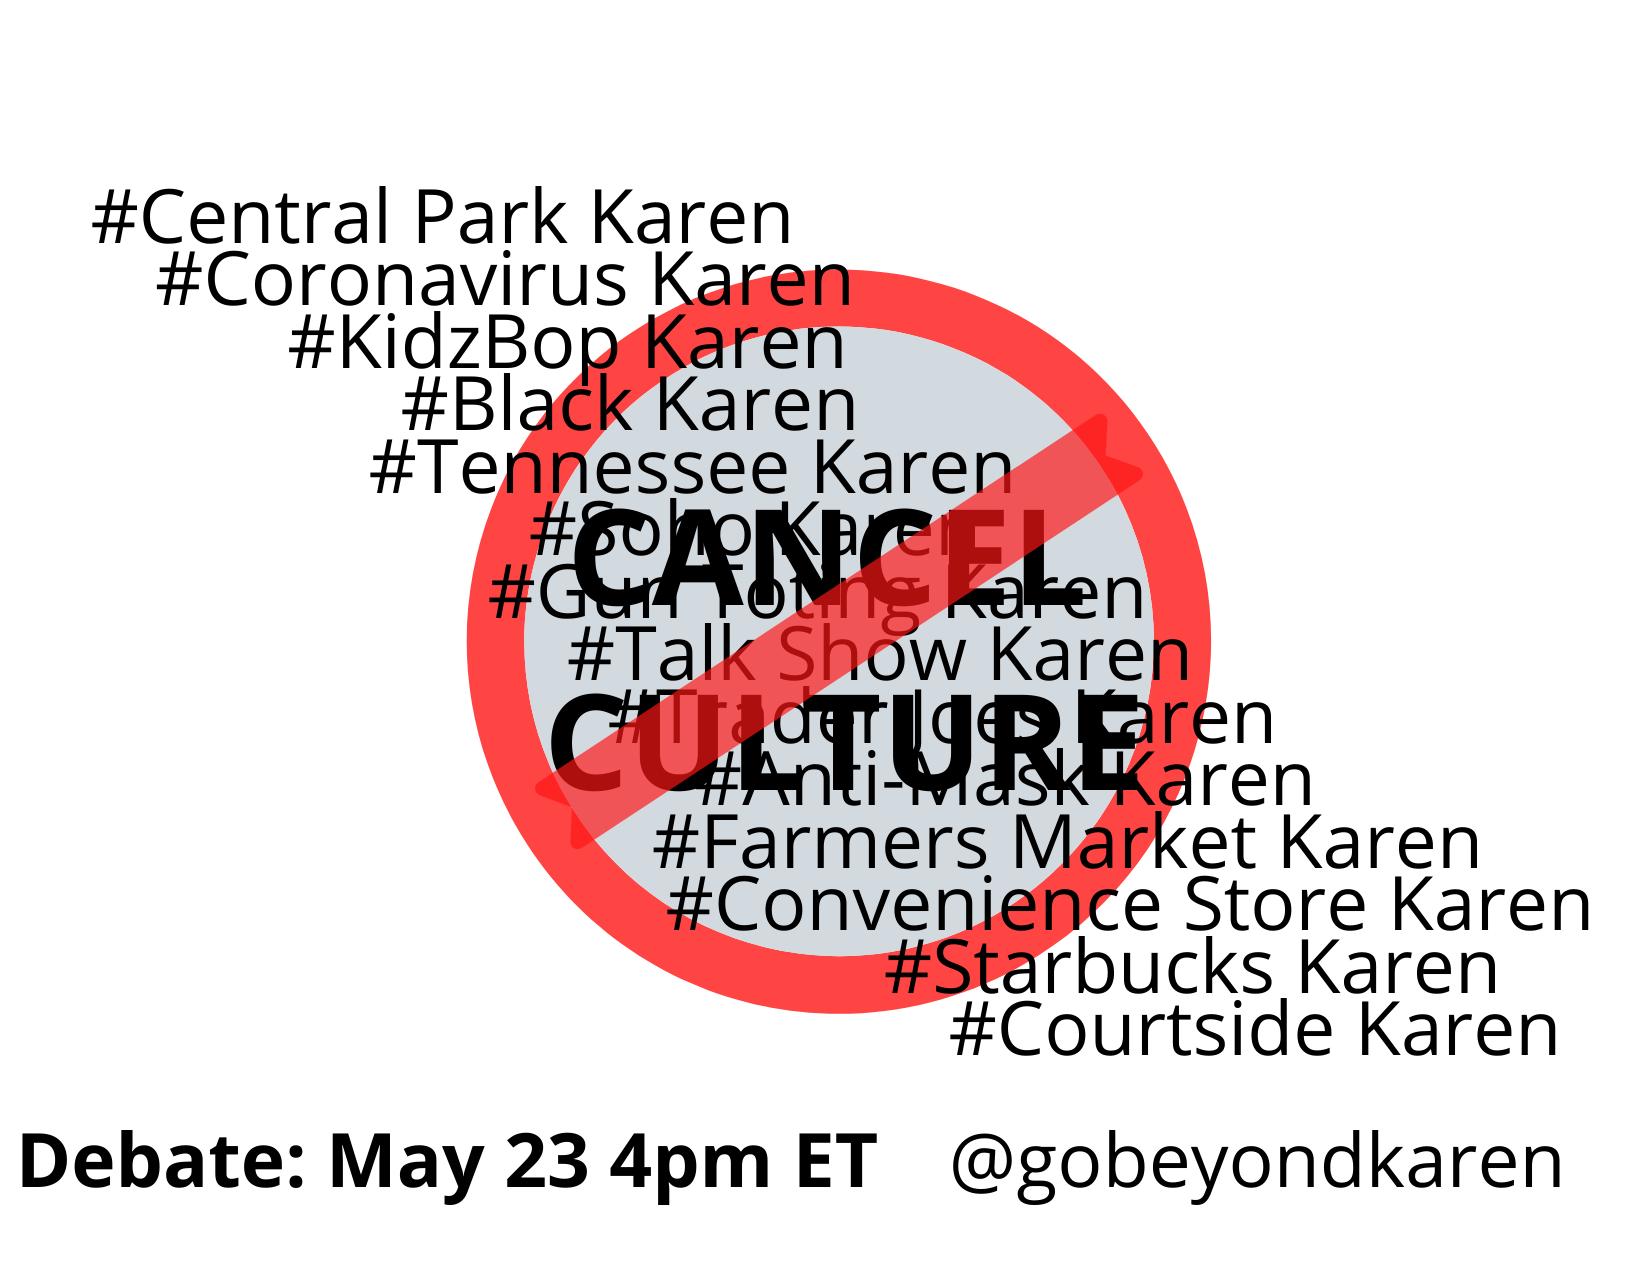 Cancel Culture Debate May 23 via Eventbrite